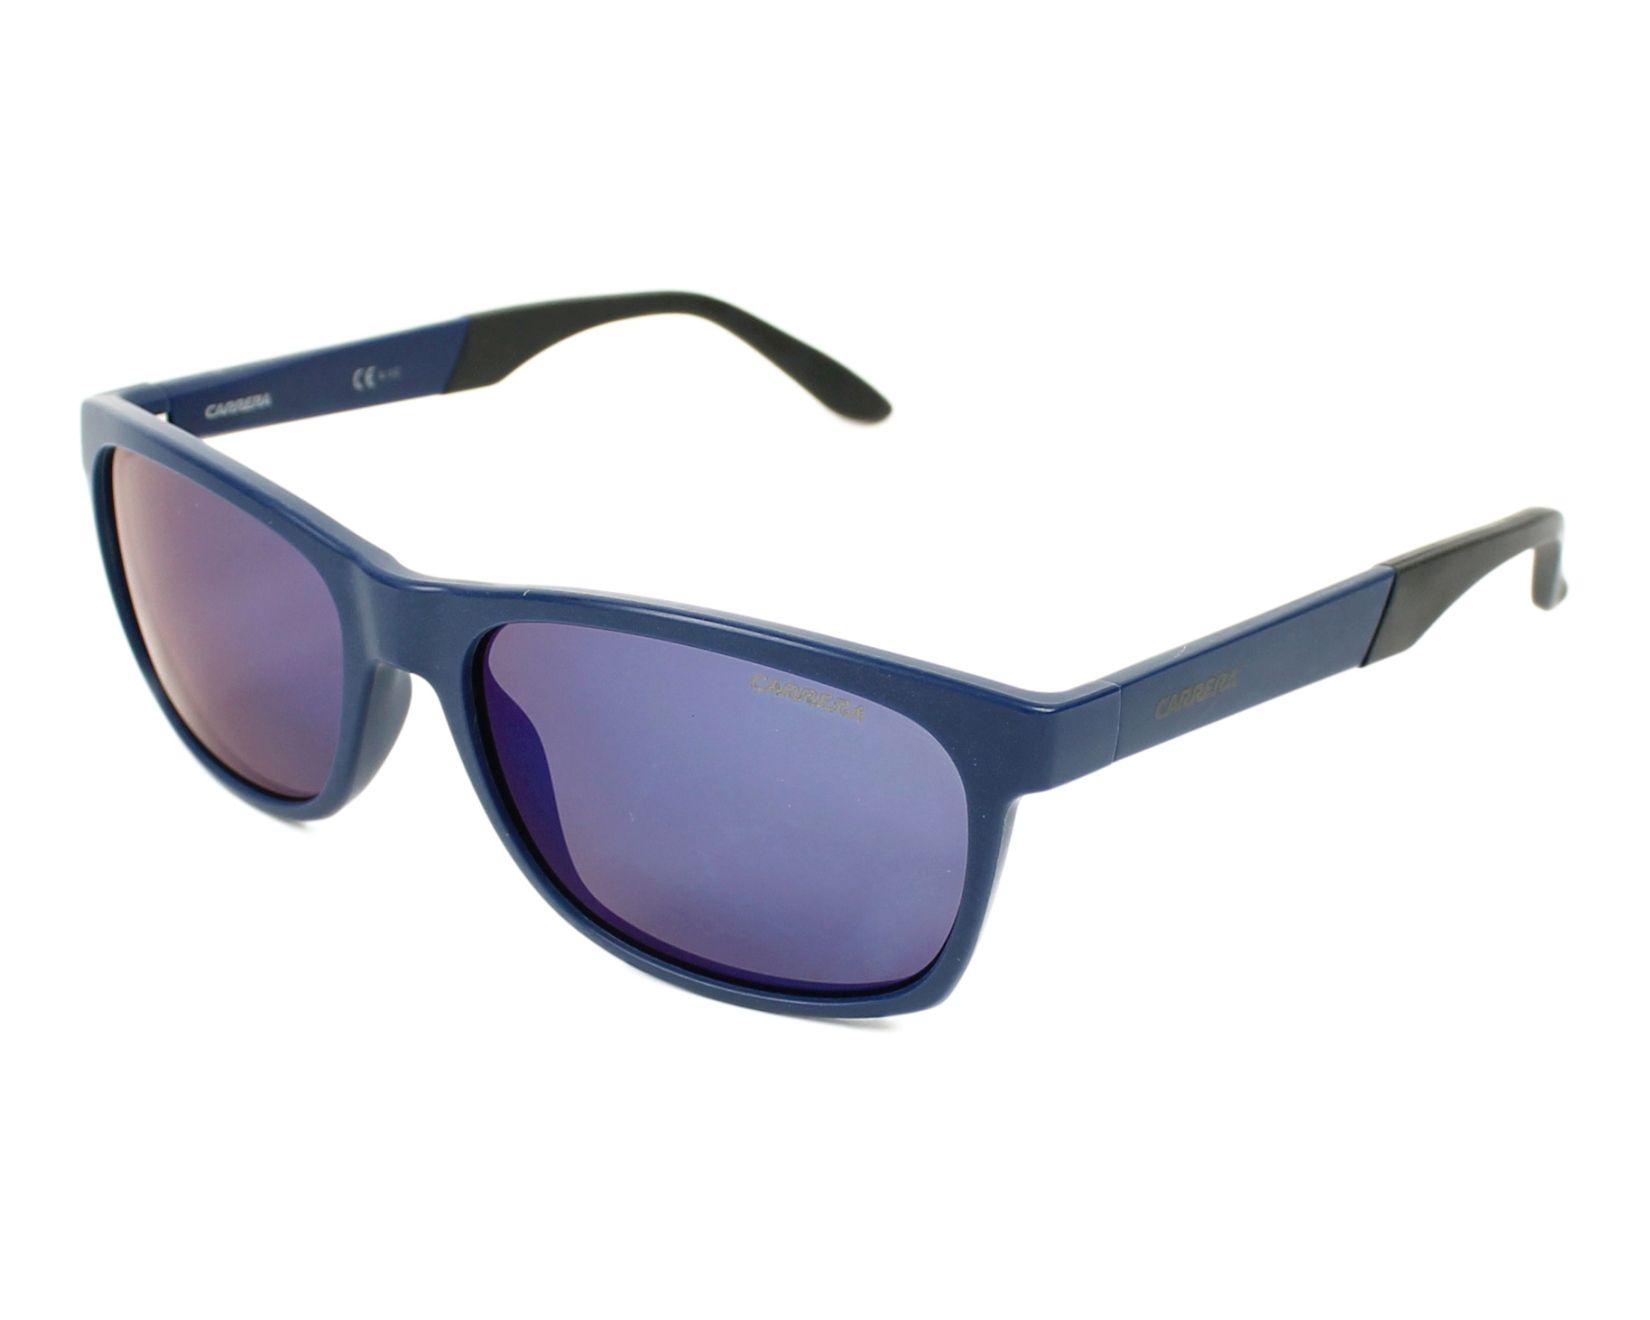 lunettes de soleil carrera 8021 s 04o 5x bleu avec des verres gris. Black Bedroom Furniture Sets. Home Design Ideas